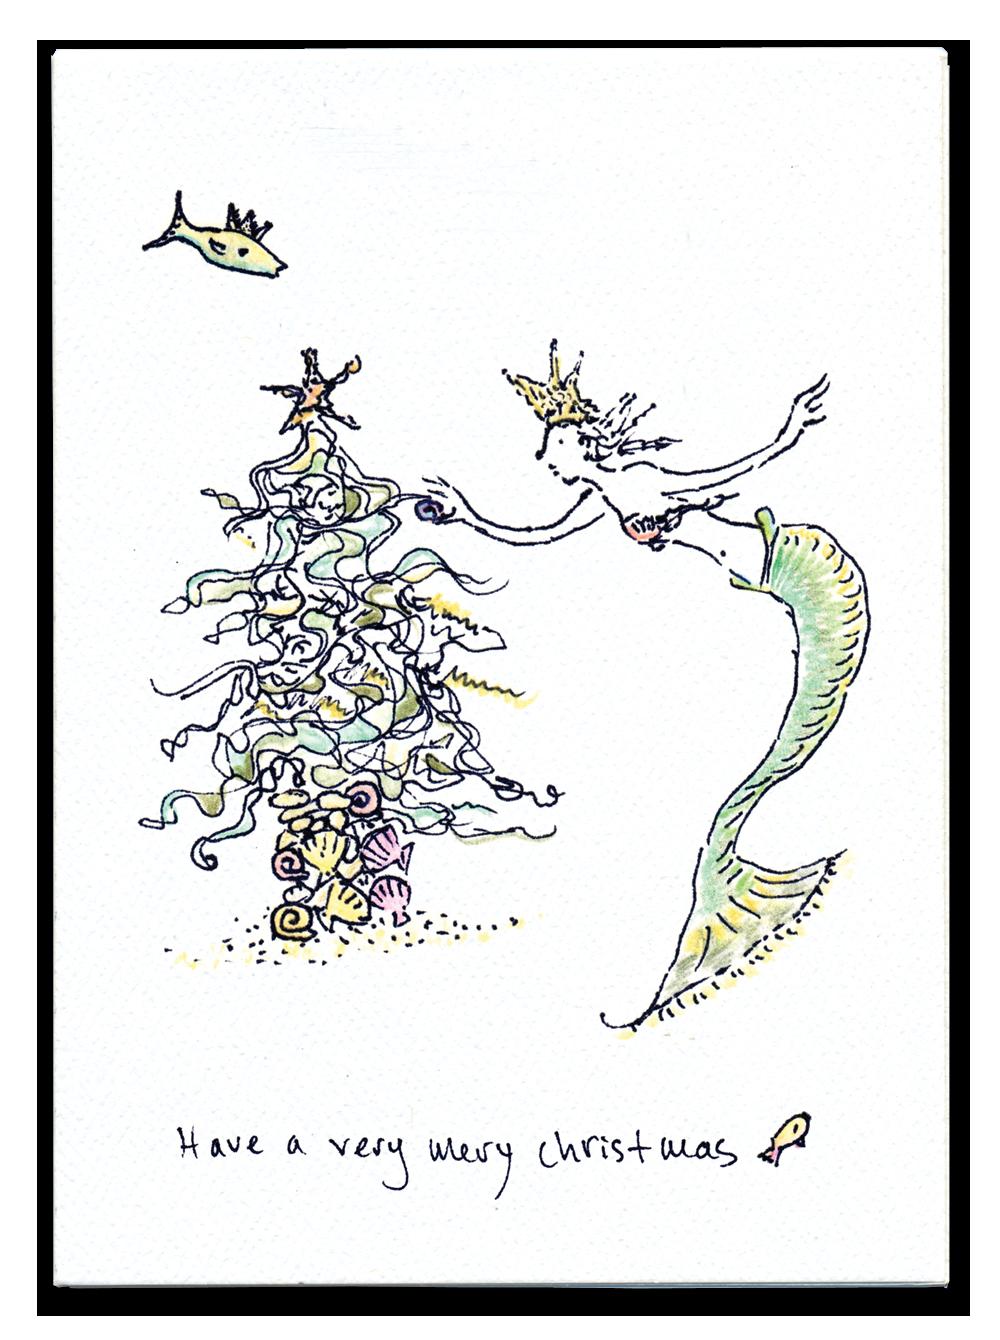 Very Mery Christmas